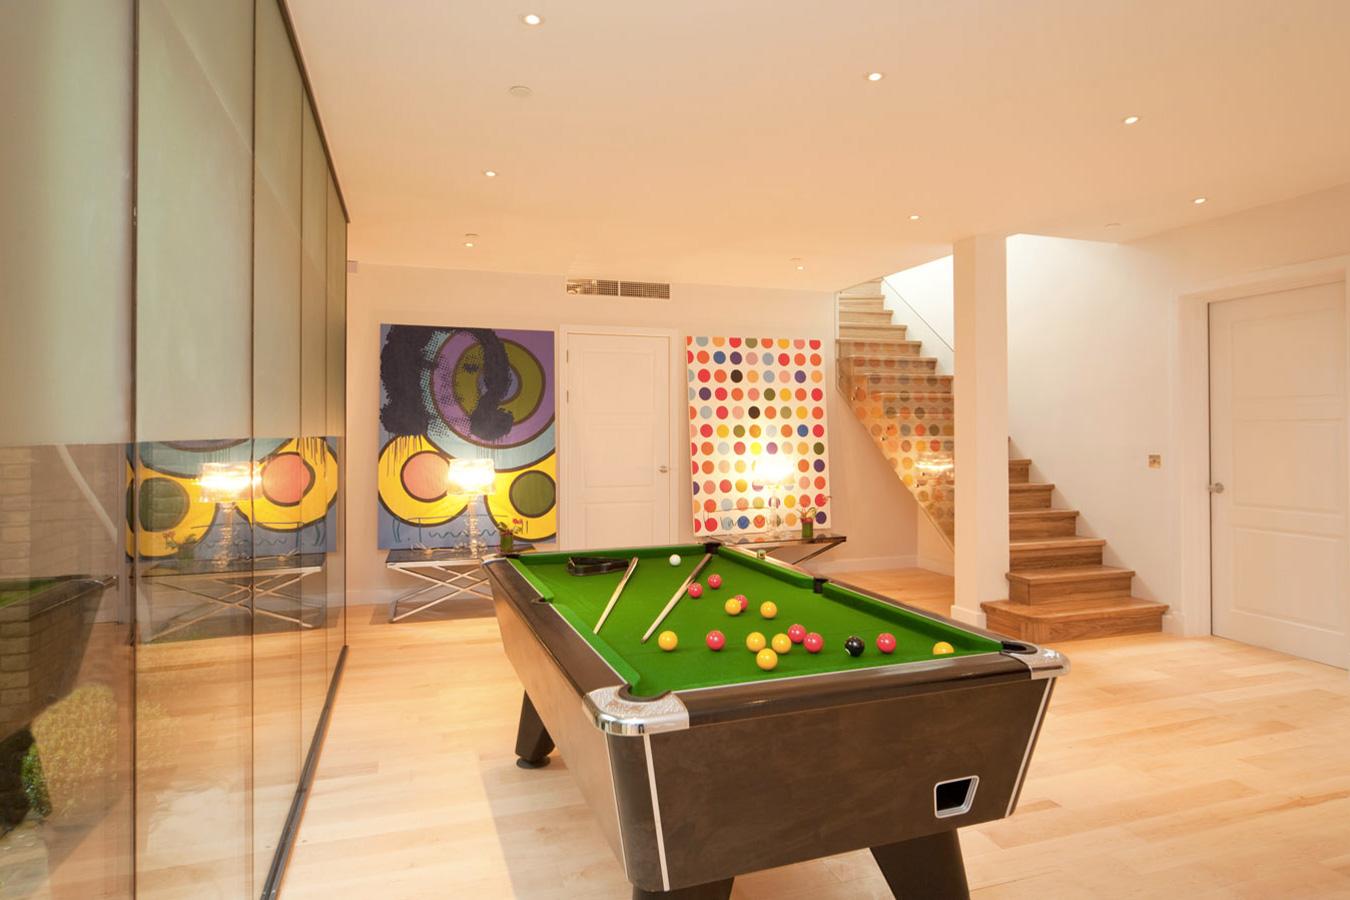 Design Box London - Interior Design - Richmond Park Home, TW10 - Games Room